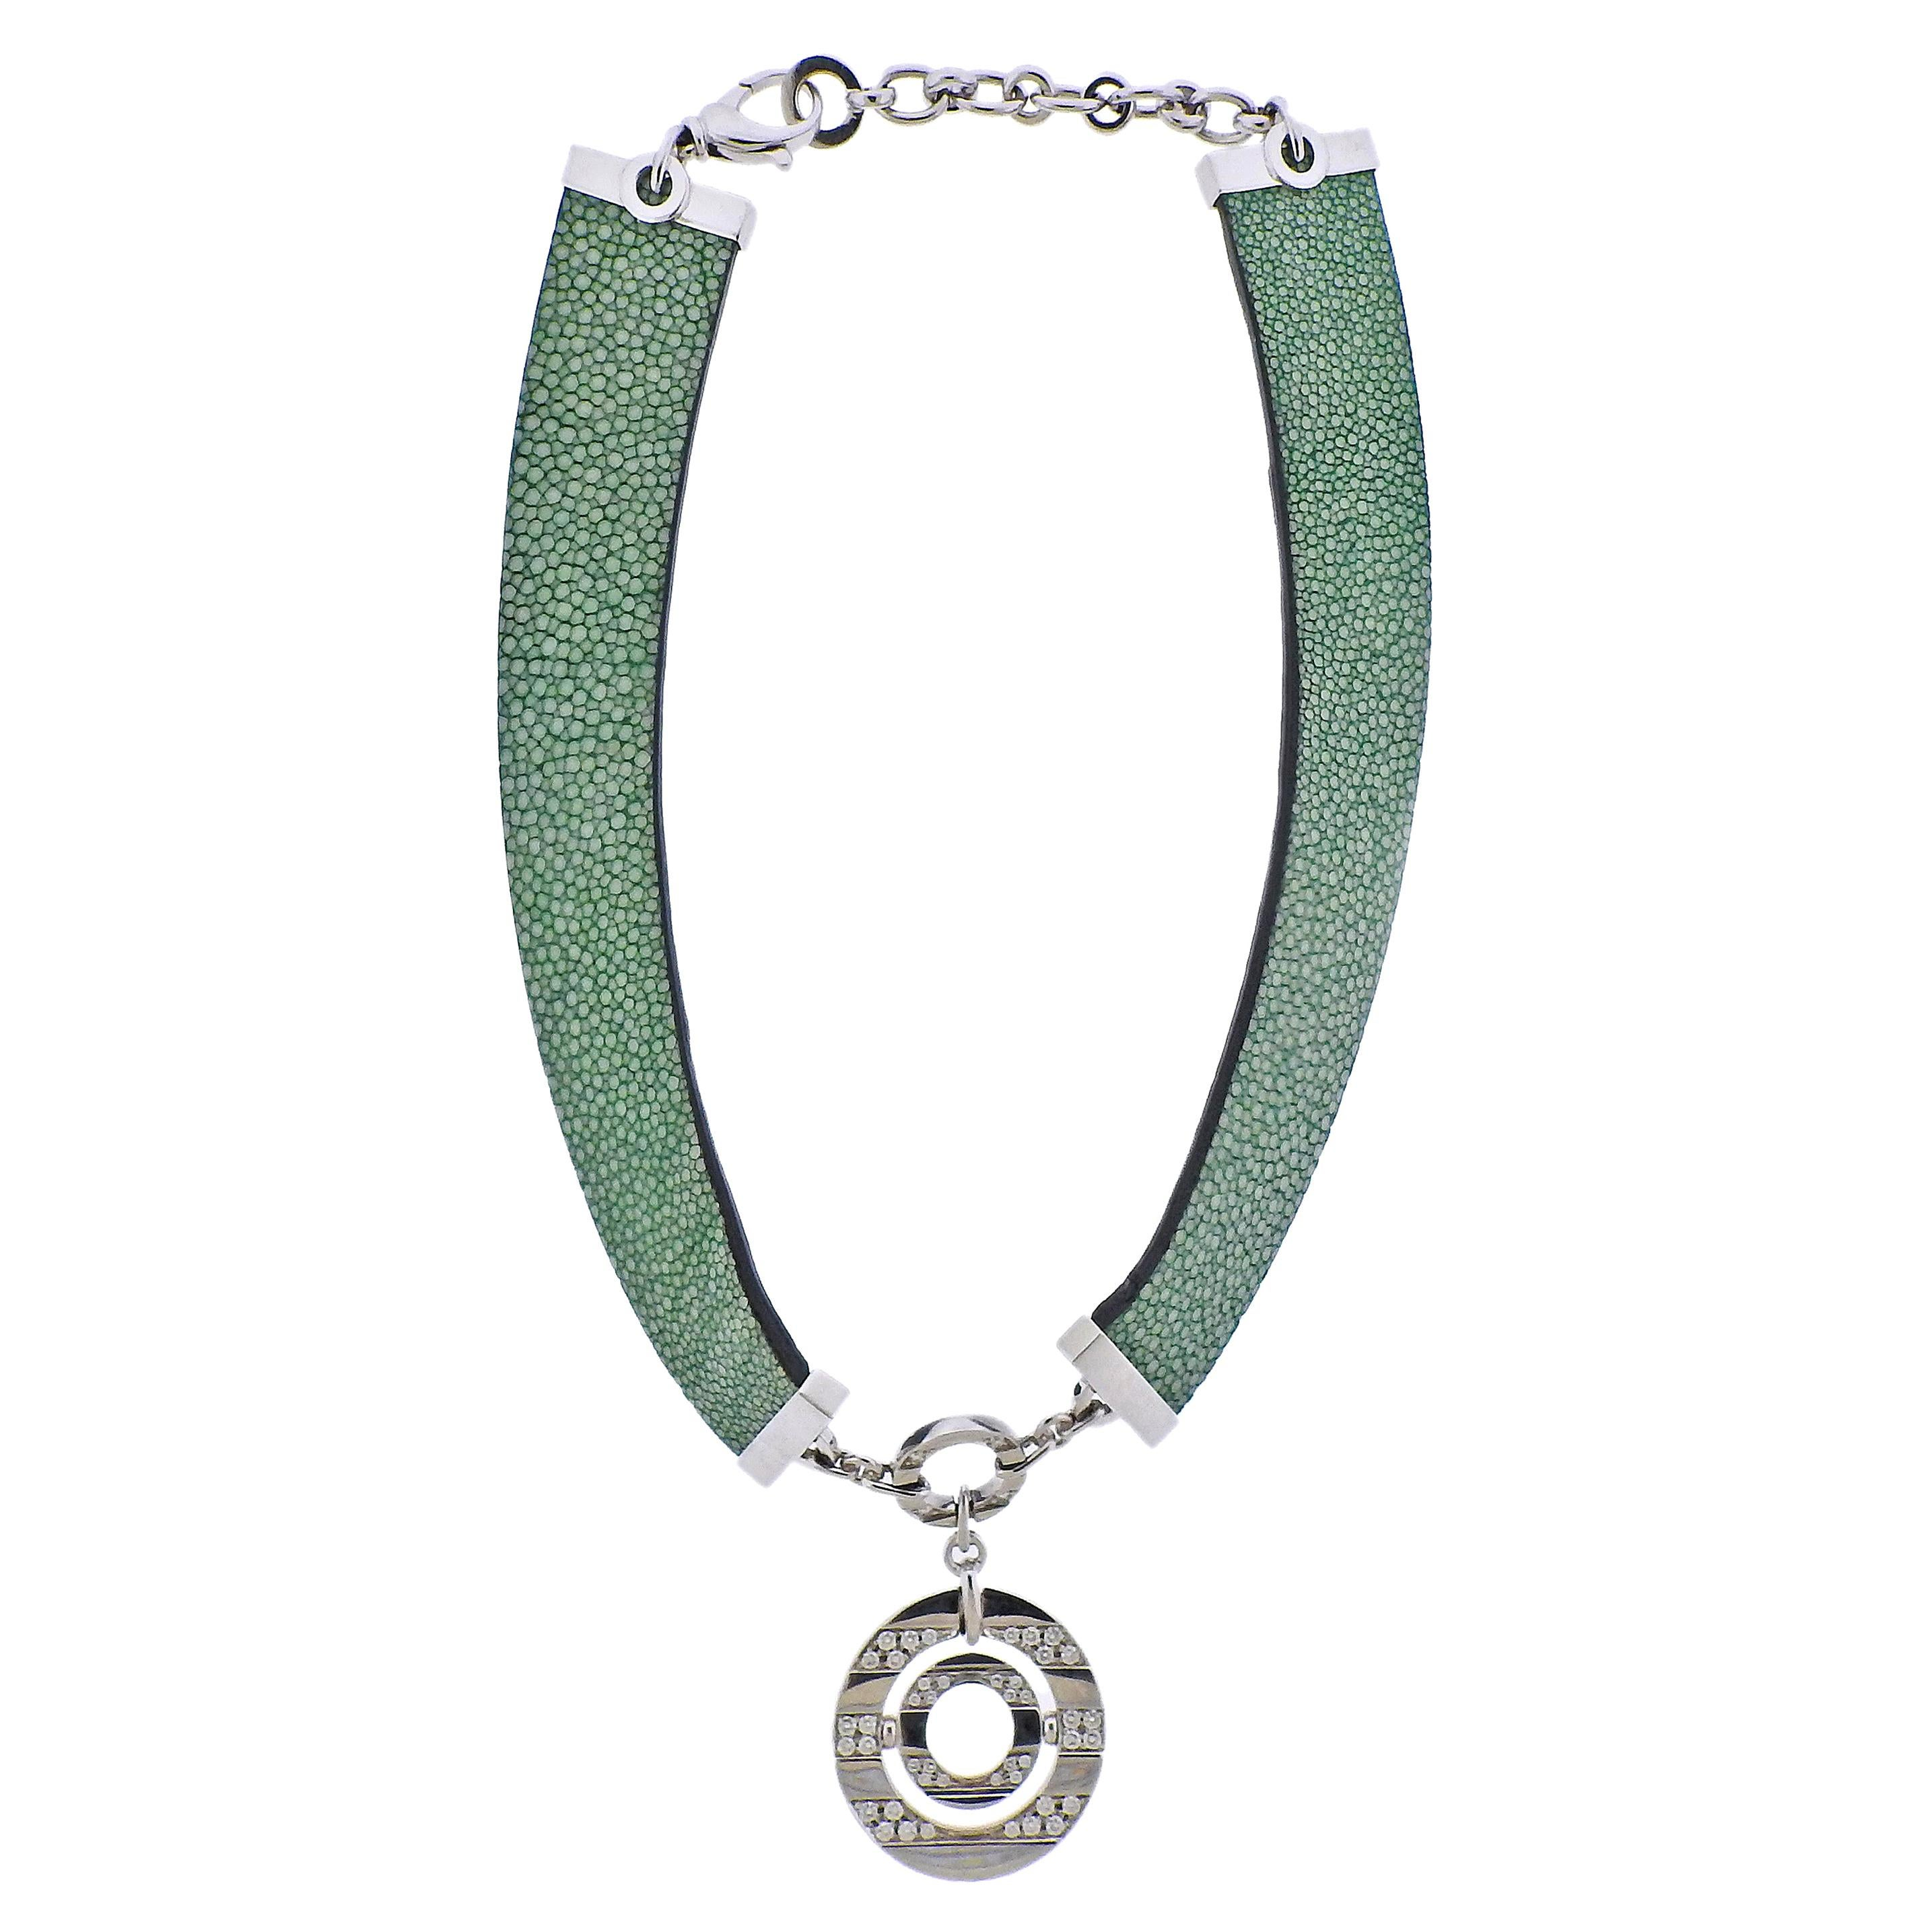 Bulgari Impressive Gold Diamond Green Ostrich Leather Collar Necklace